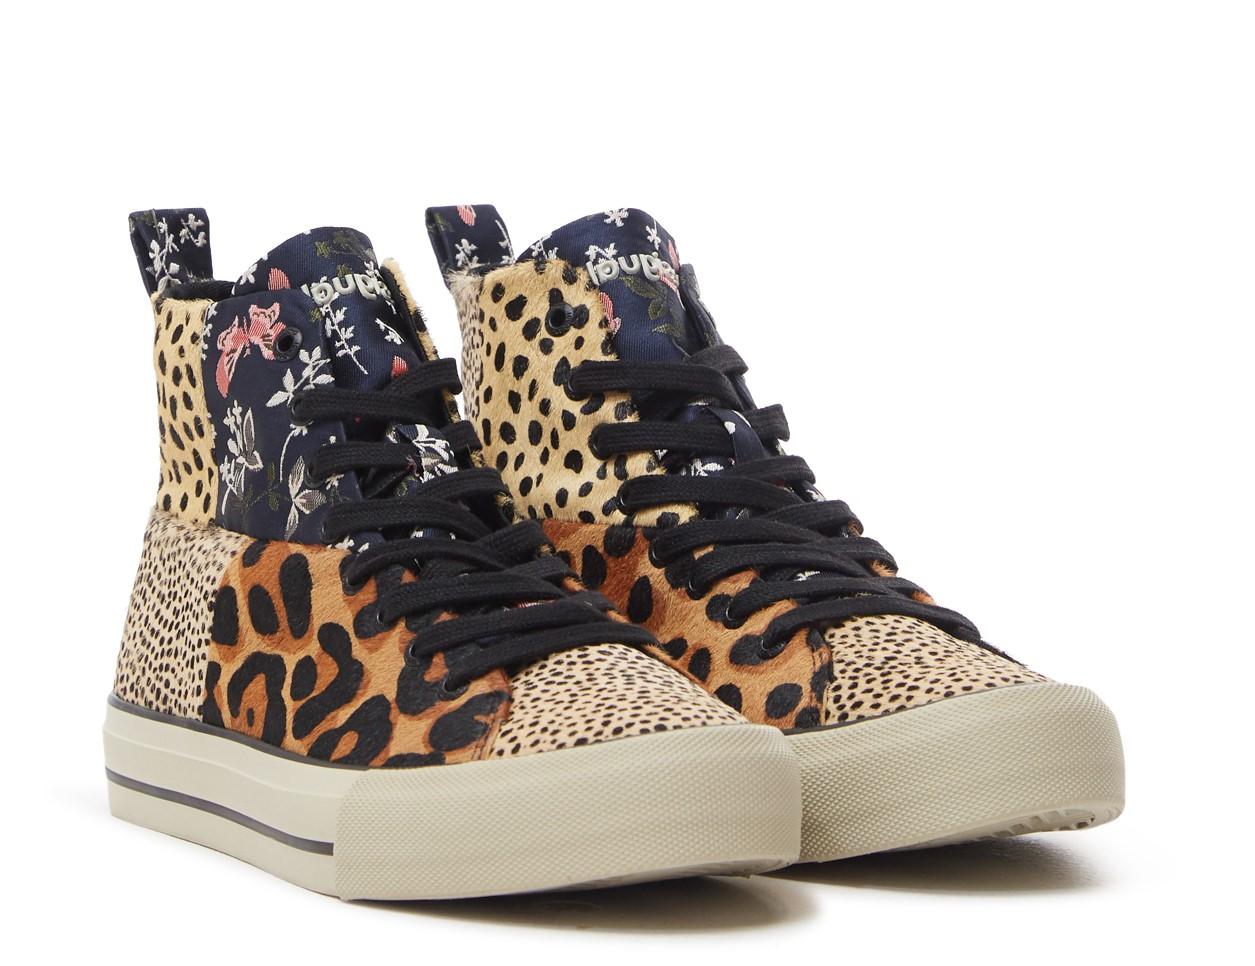 Sneakers montantes Desigual Patch Fourrure 21WSKL03 6007